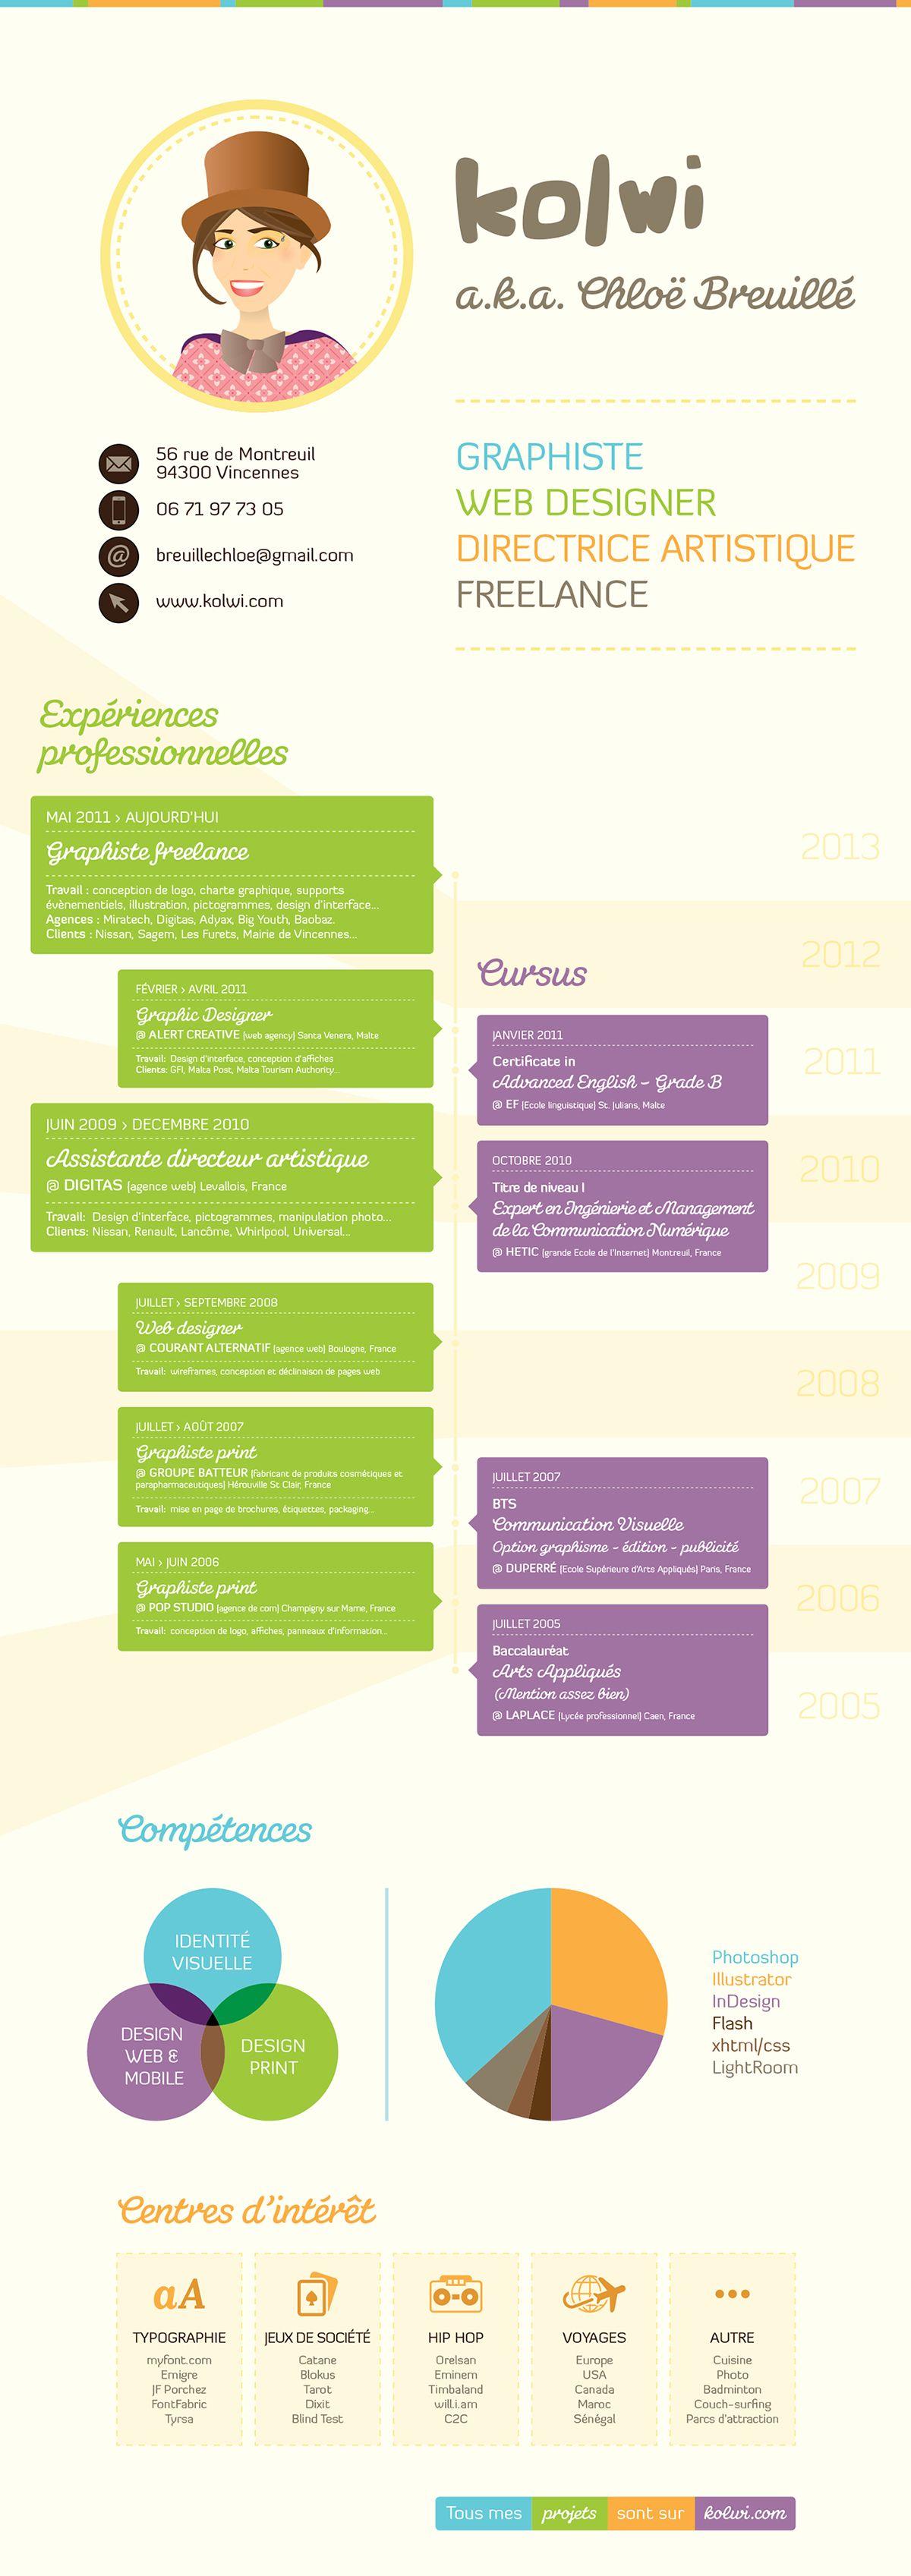 kolwi  freelance  graphic designer  artdirector  resume  cv  2013